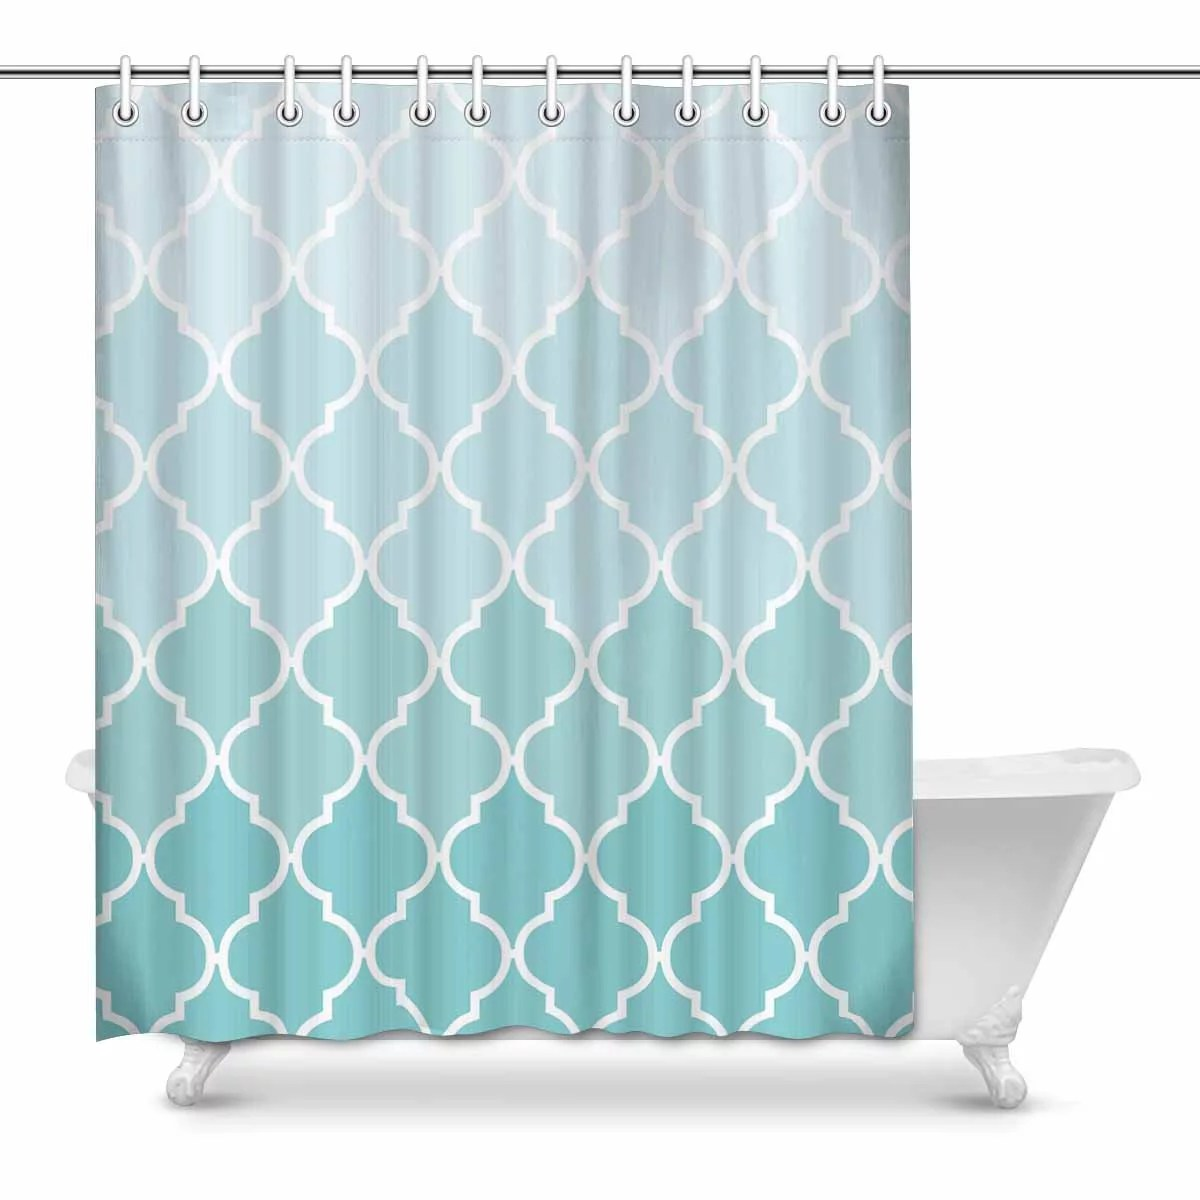 yusdecor moroccan tile quatrefoil aqua teal fade waterproof polyester fabric shower curtain bathroom sets home decor 60x72 inch